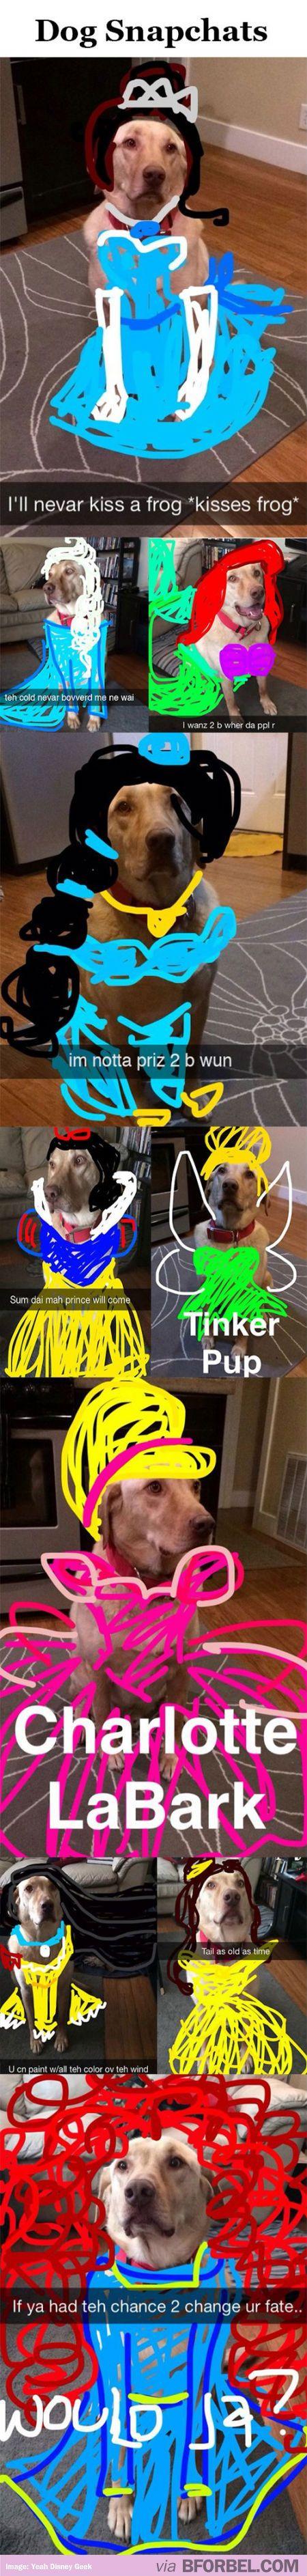 10 Snapchats That Turned This Dog Into A Disney Princess…